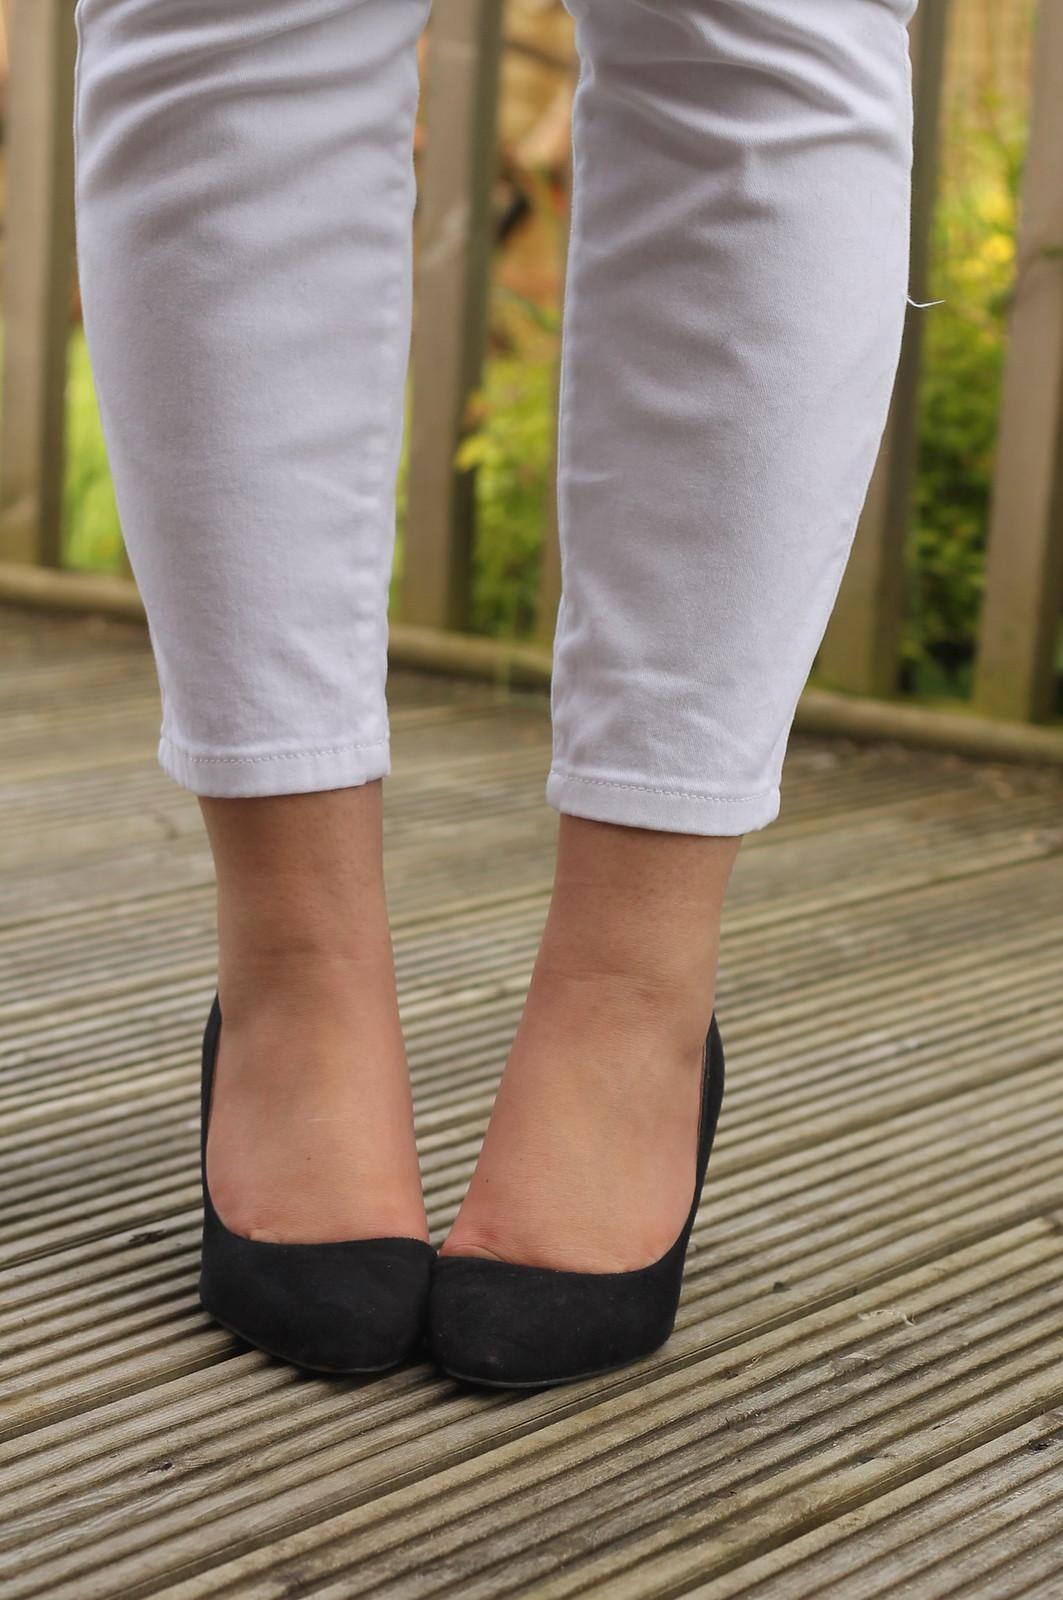 Black heels with white capris